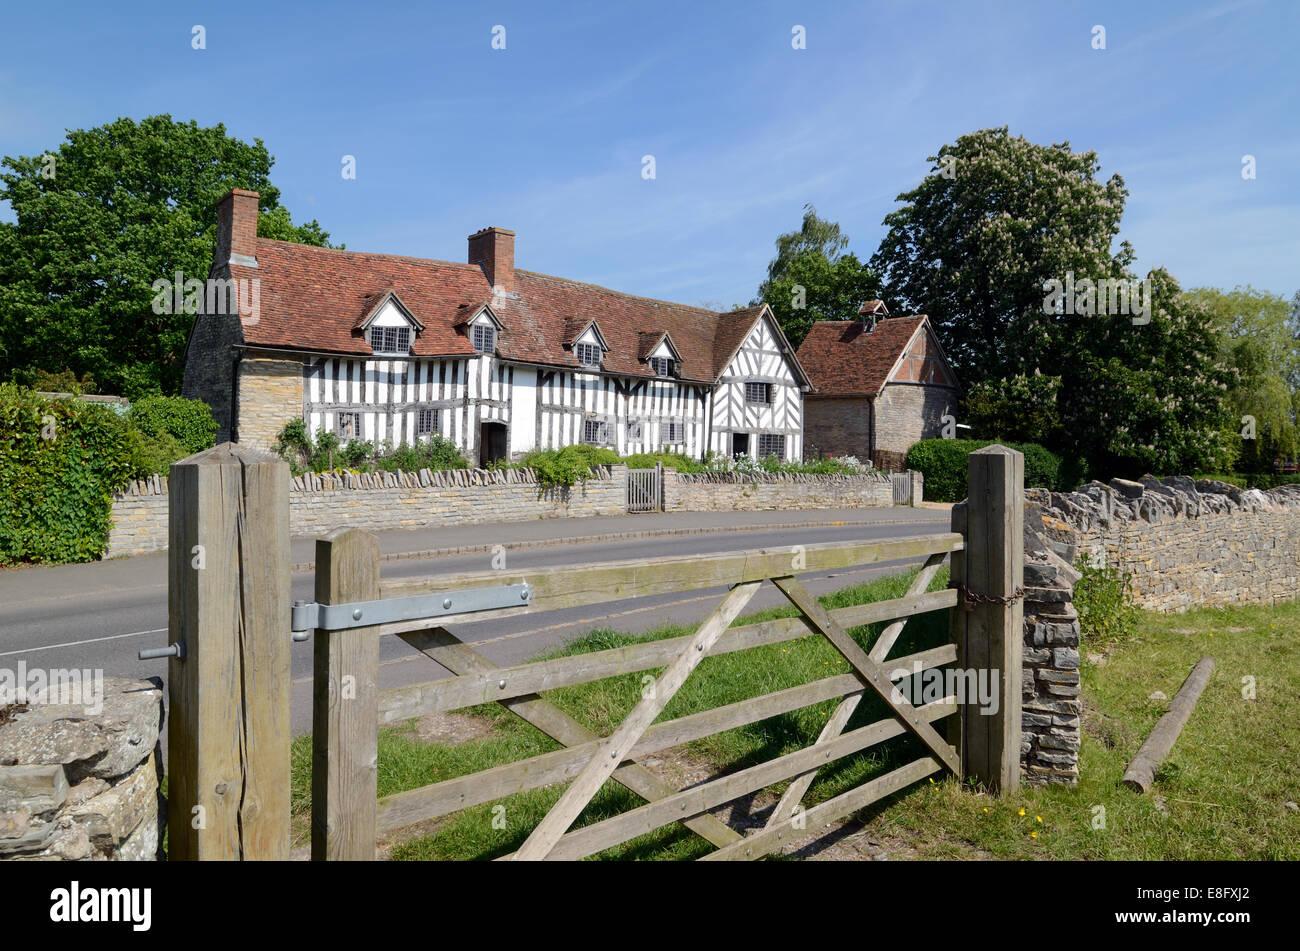 Mary Arden House Wilmcote near Stratford-upon-Avon Warwickshire England - Stock Image